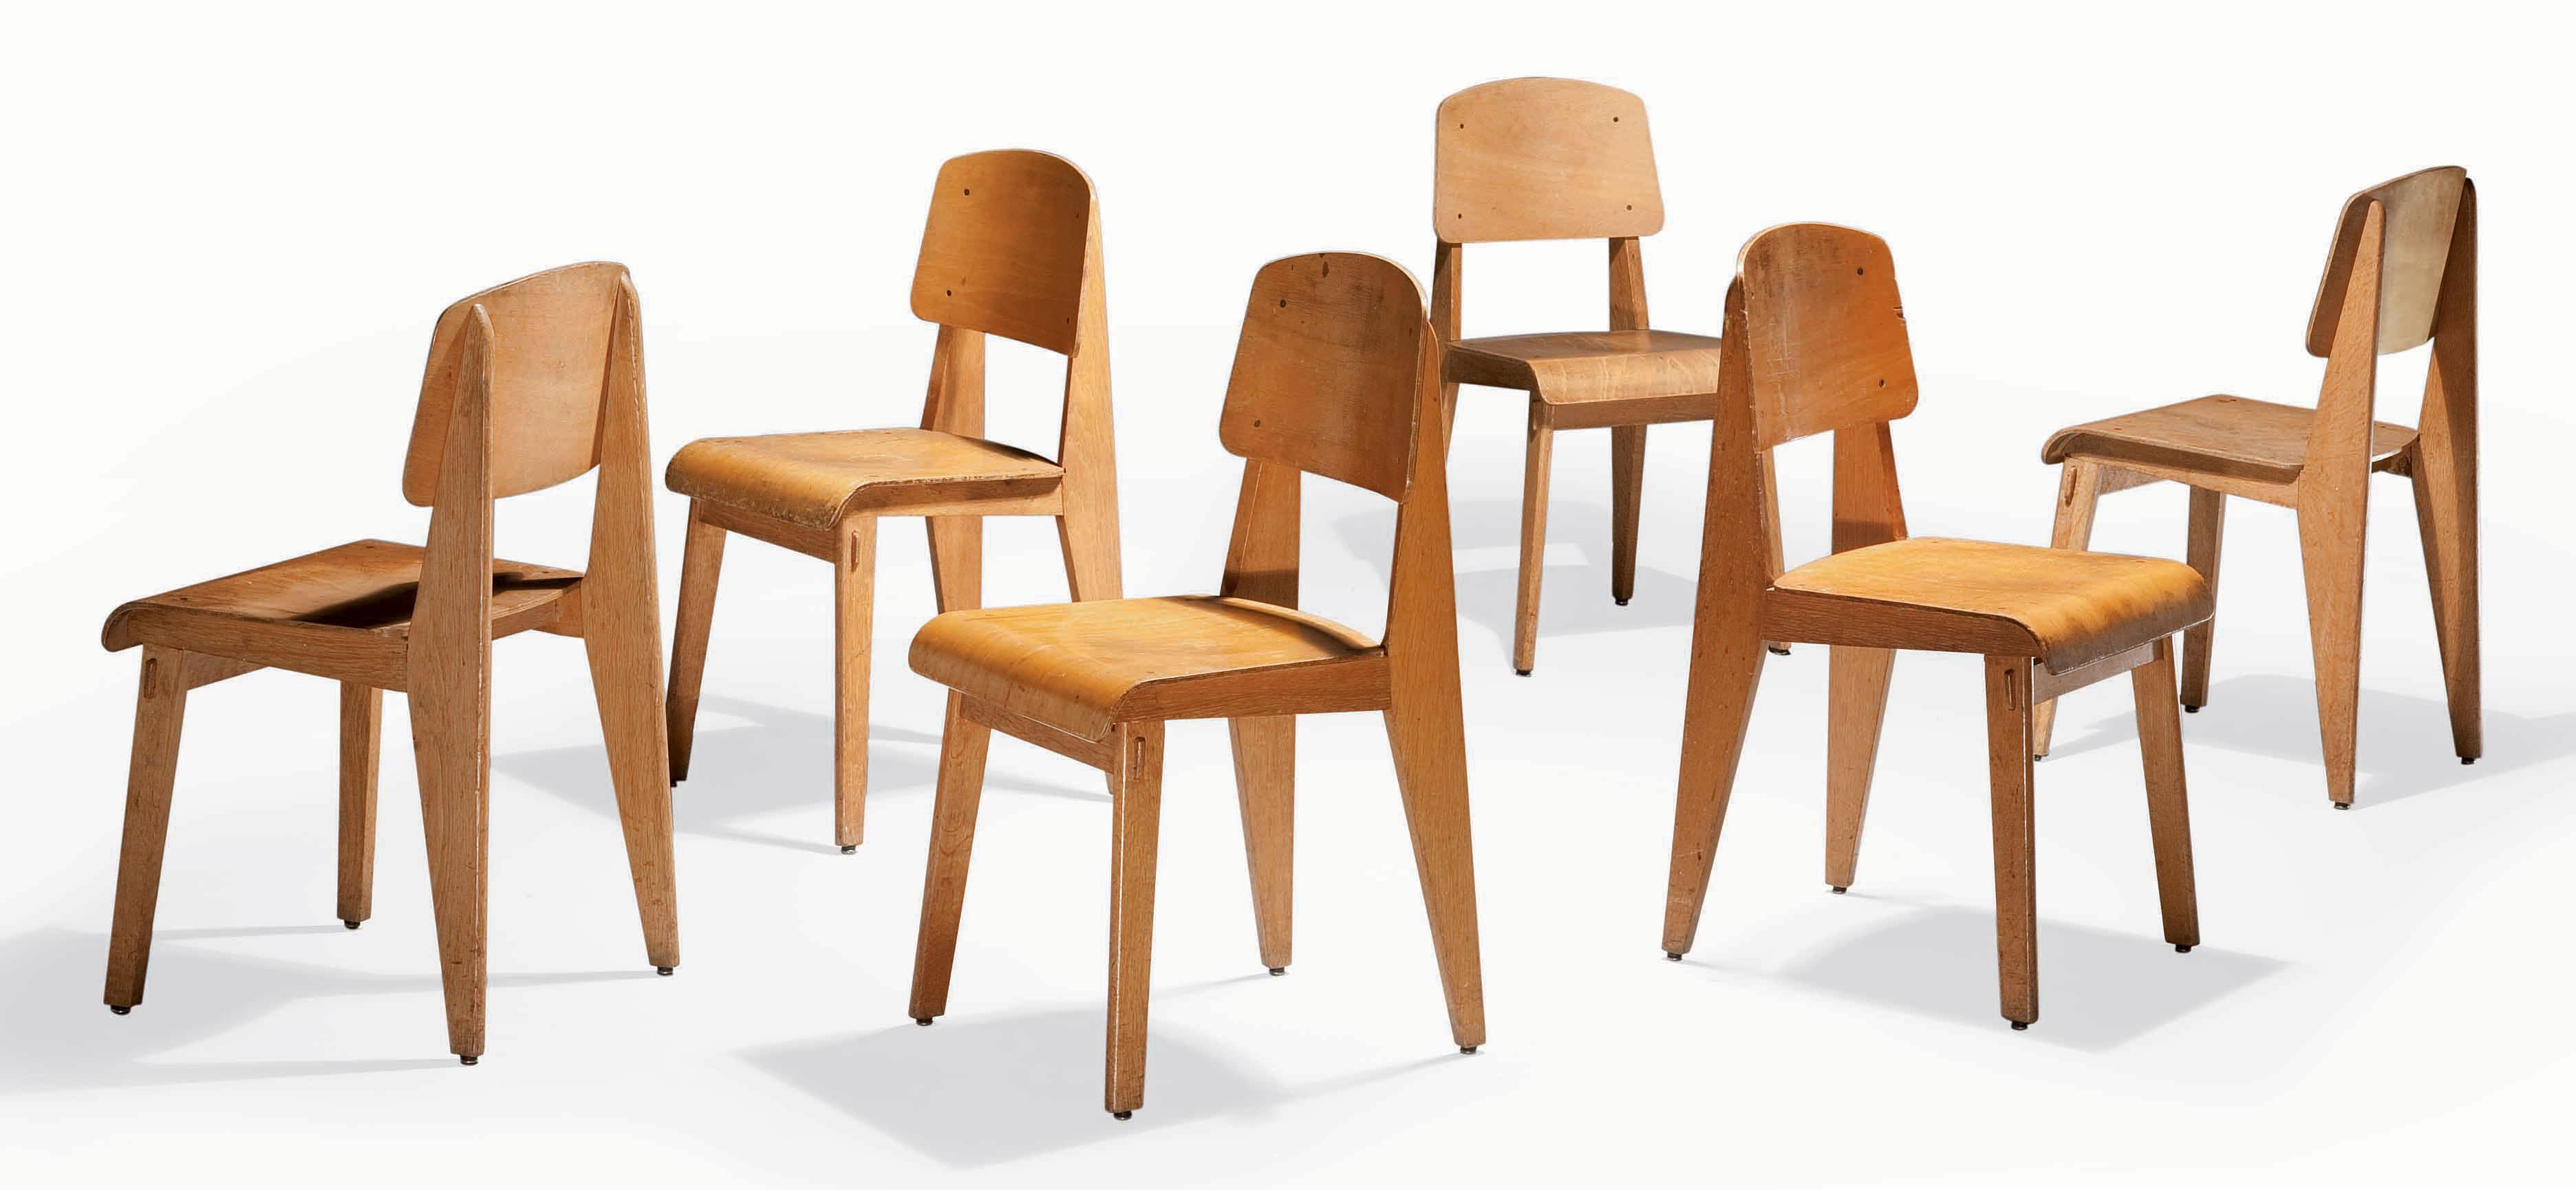 chaise standard jean prouv best reform kitchen chair. Black Bedroom Furniture Sets. Home Design Ideas